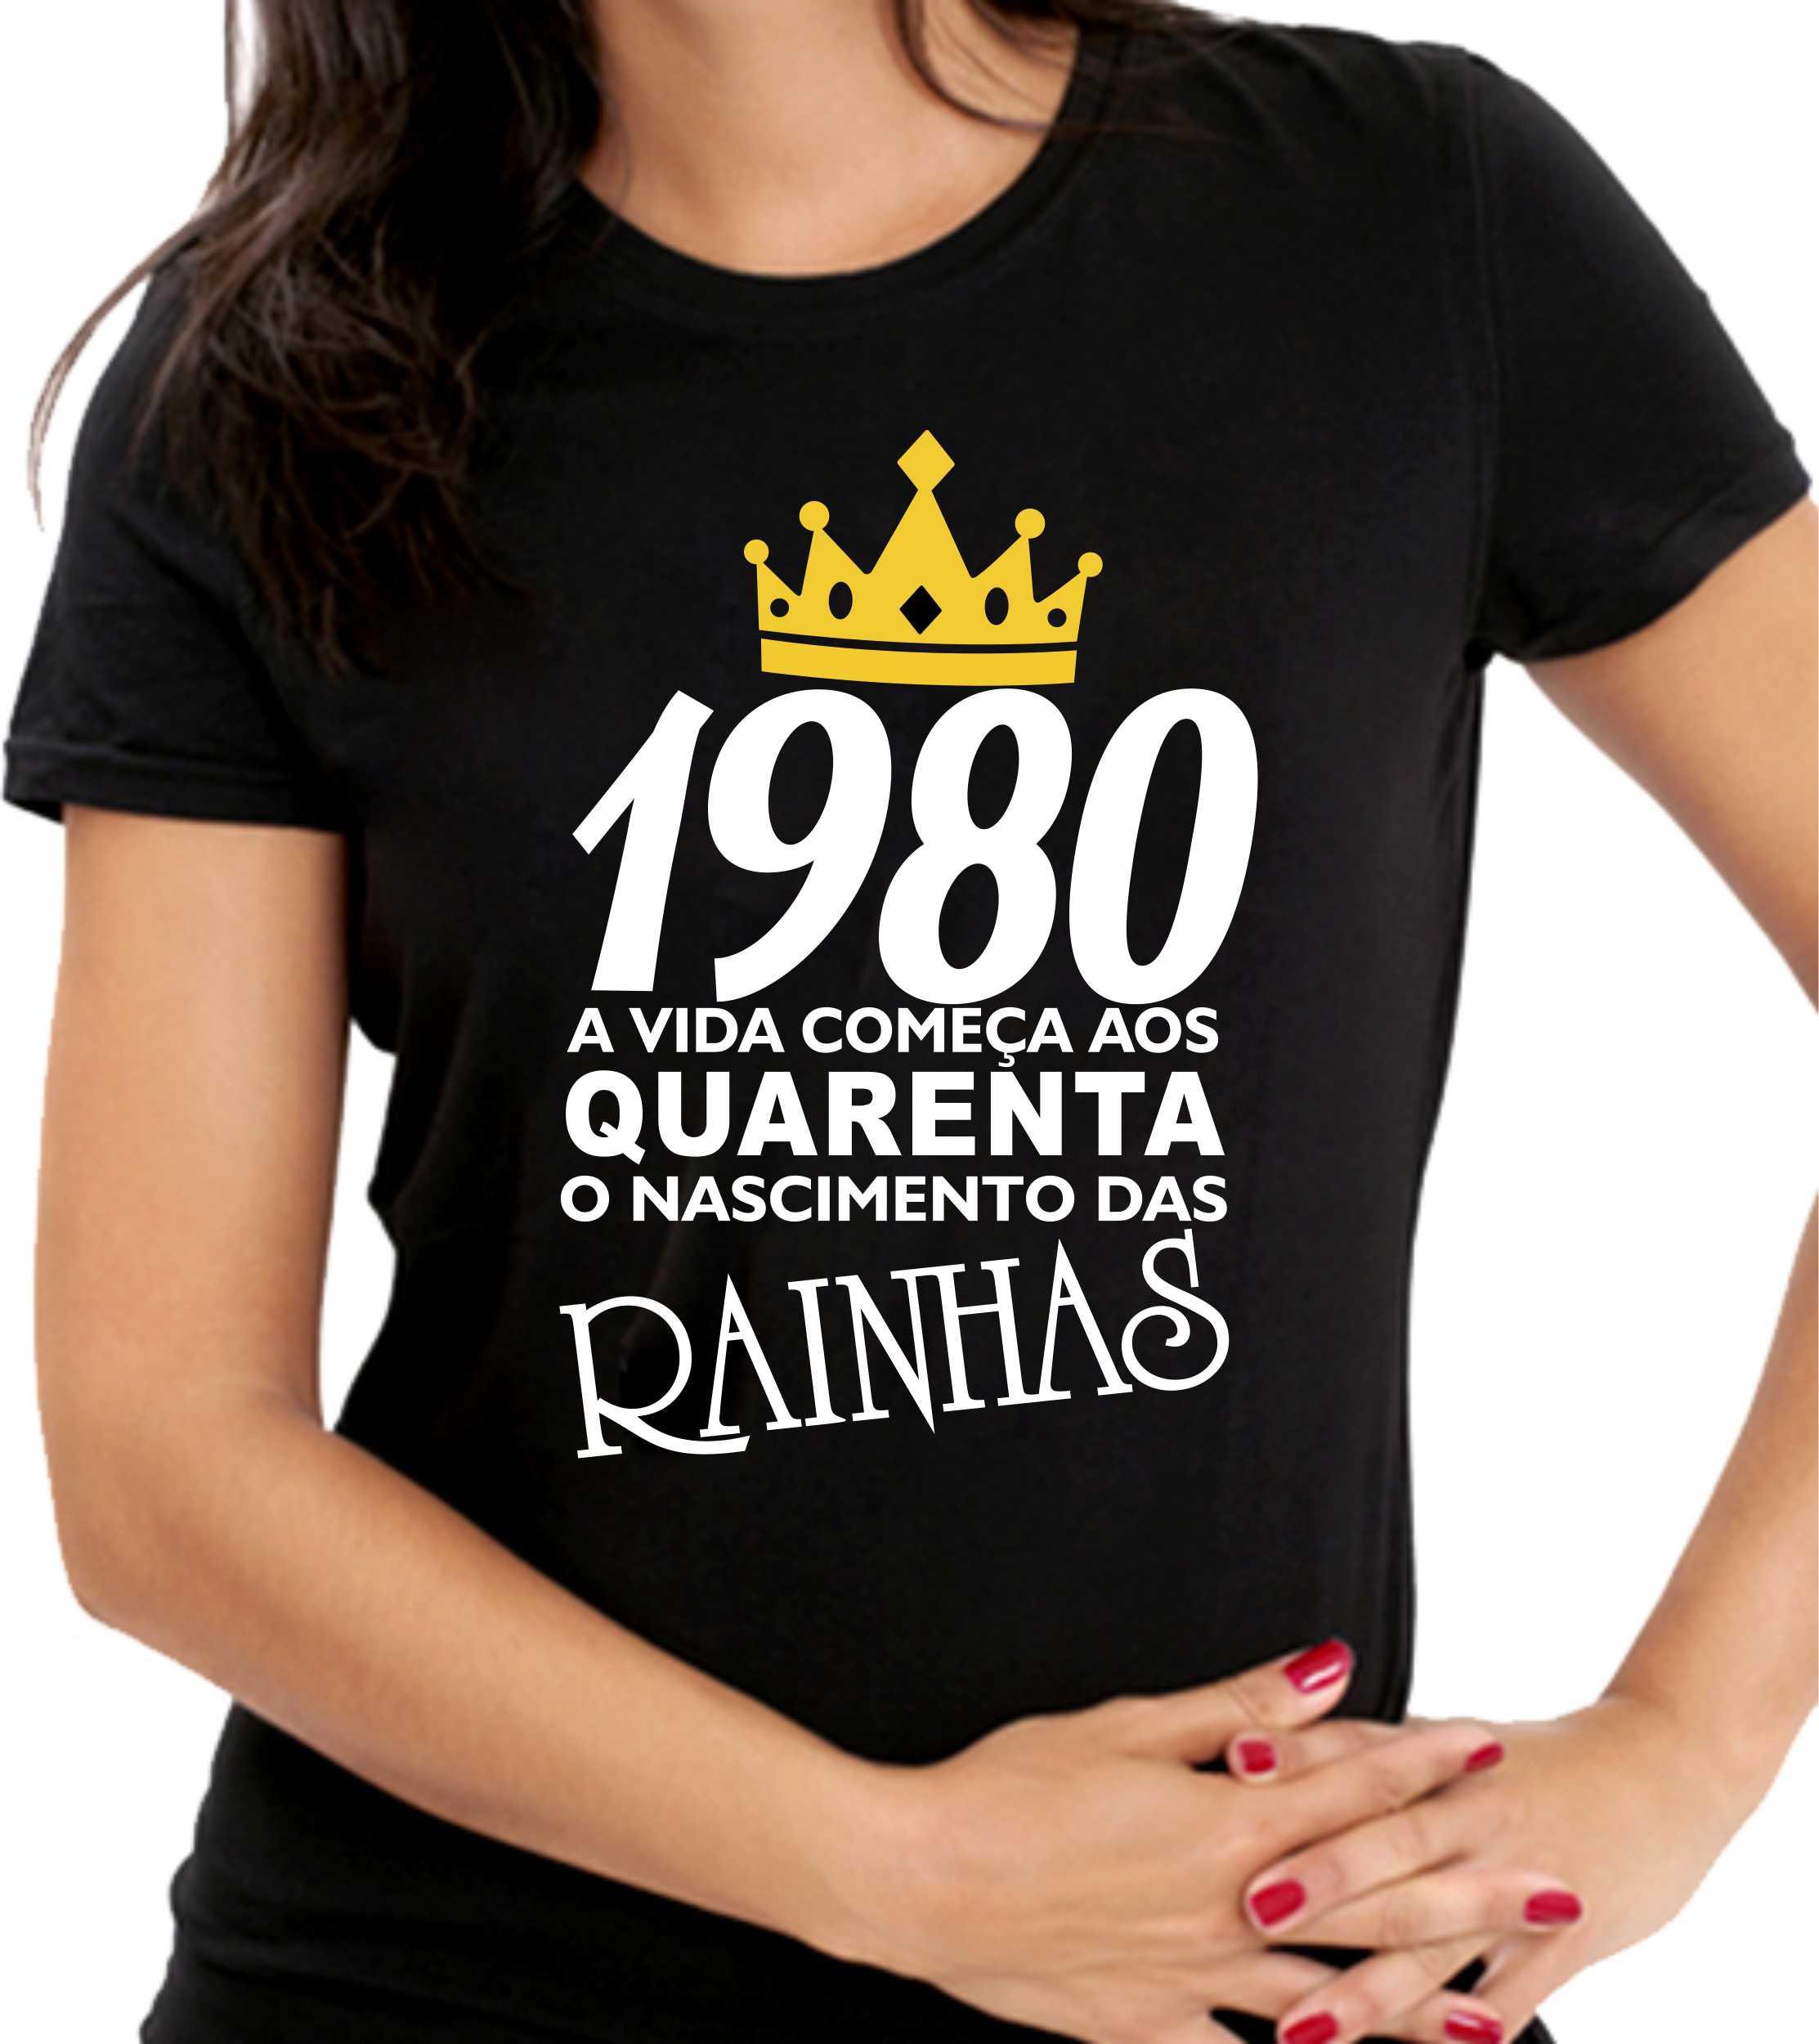 Camiseta das Rainhas